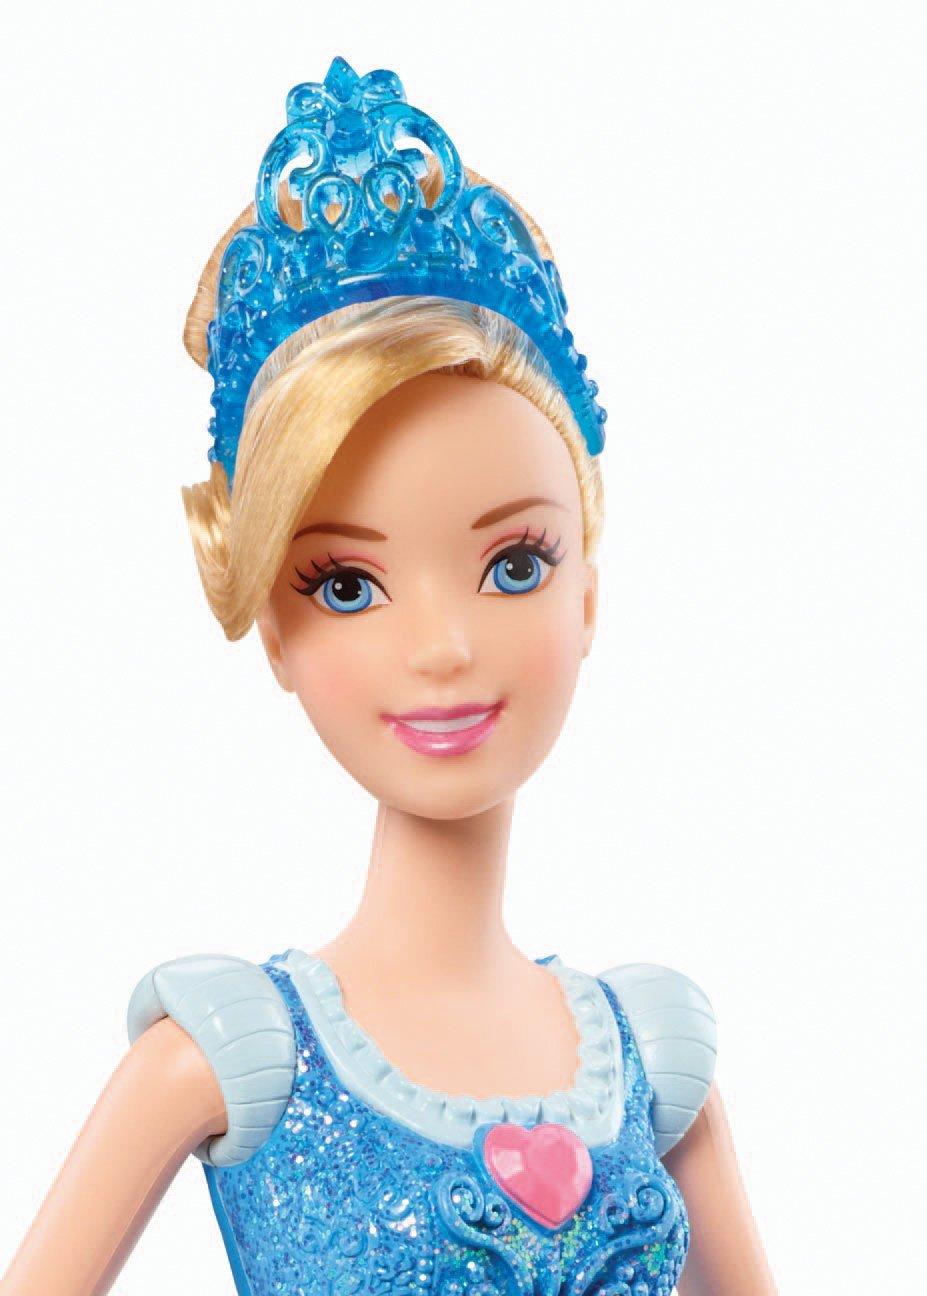 Disney Princess Sparkling Princess Cinderella Doll Mattel BBM21